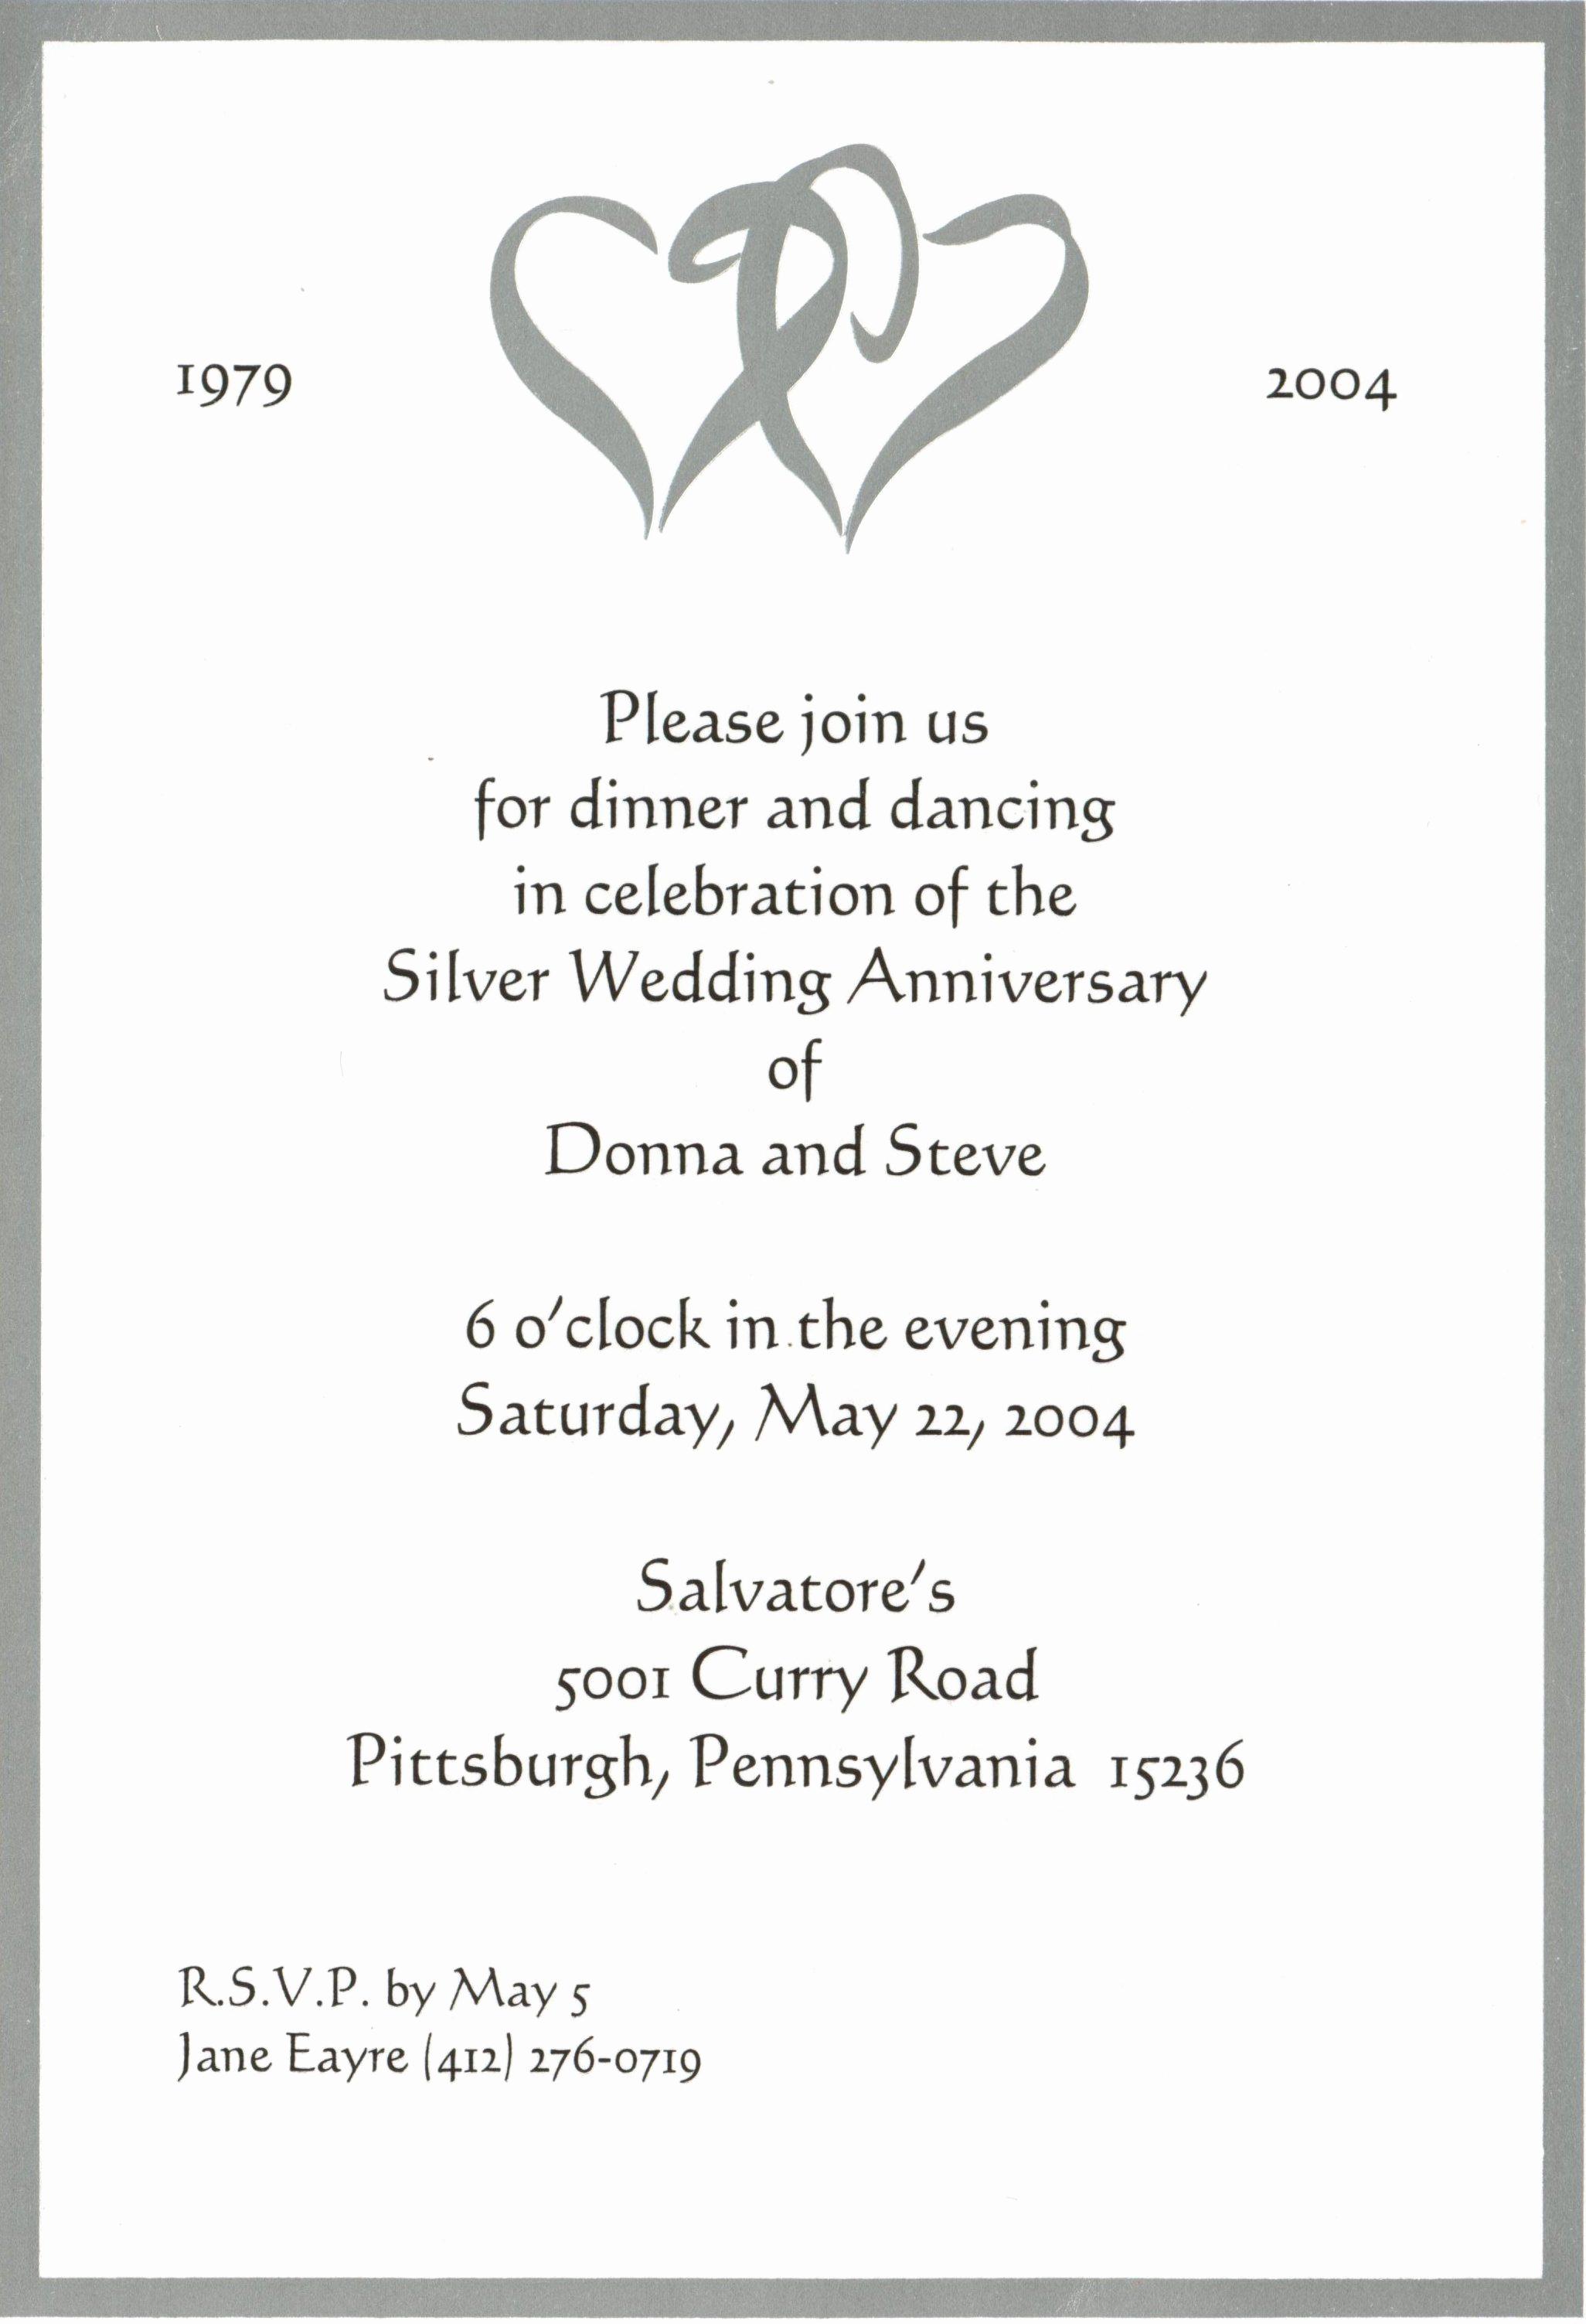 50th Anniversary Invitation Wording Beautiful 50th Wedding Anniversary Invitation Templates Awesome